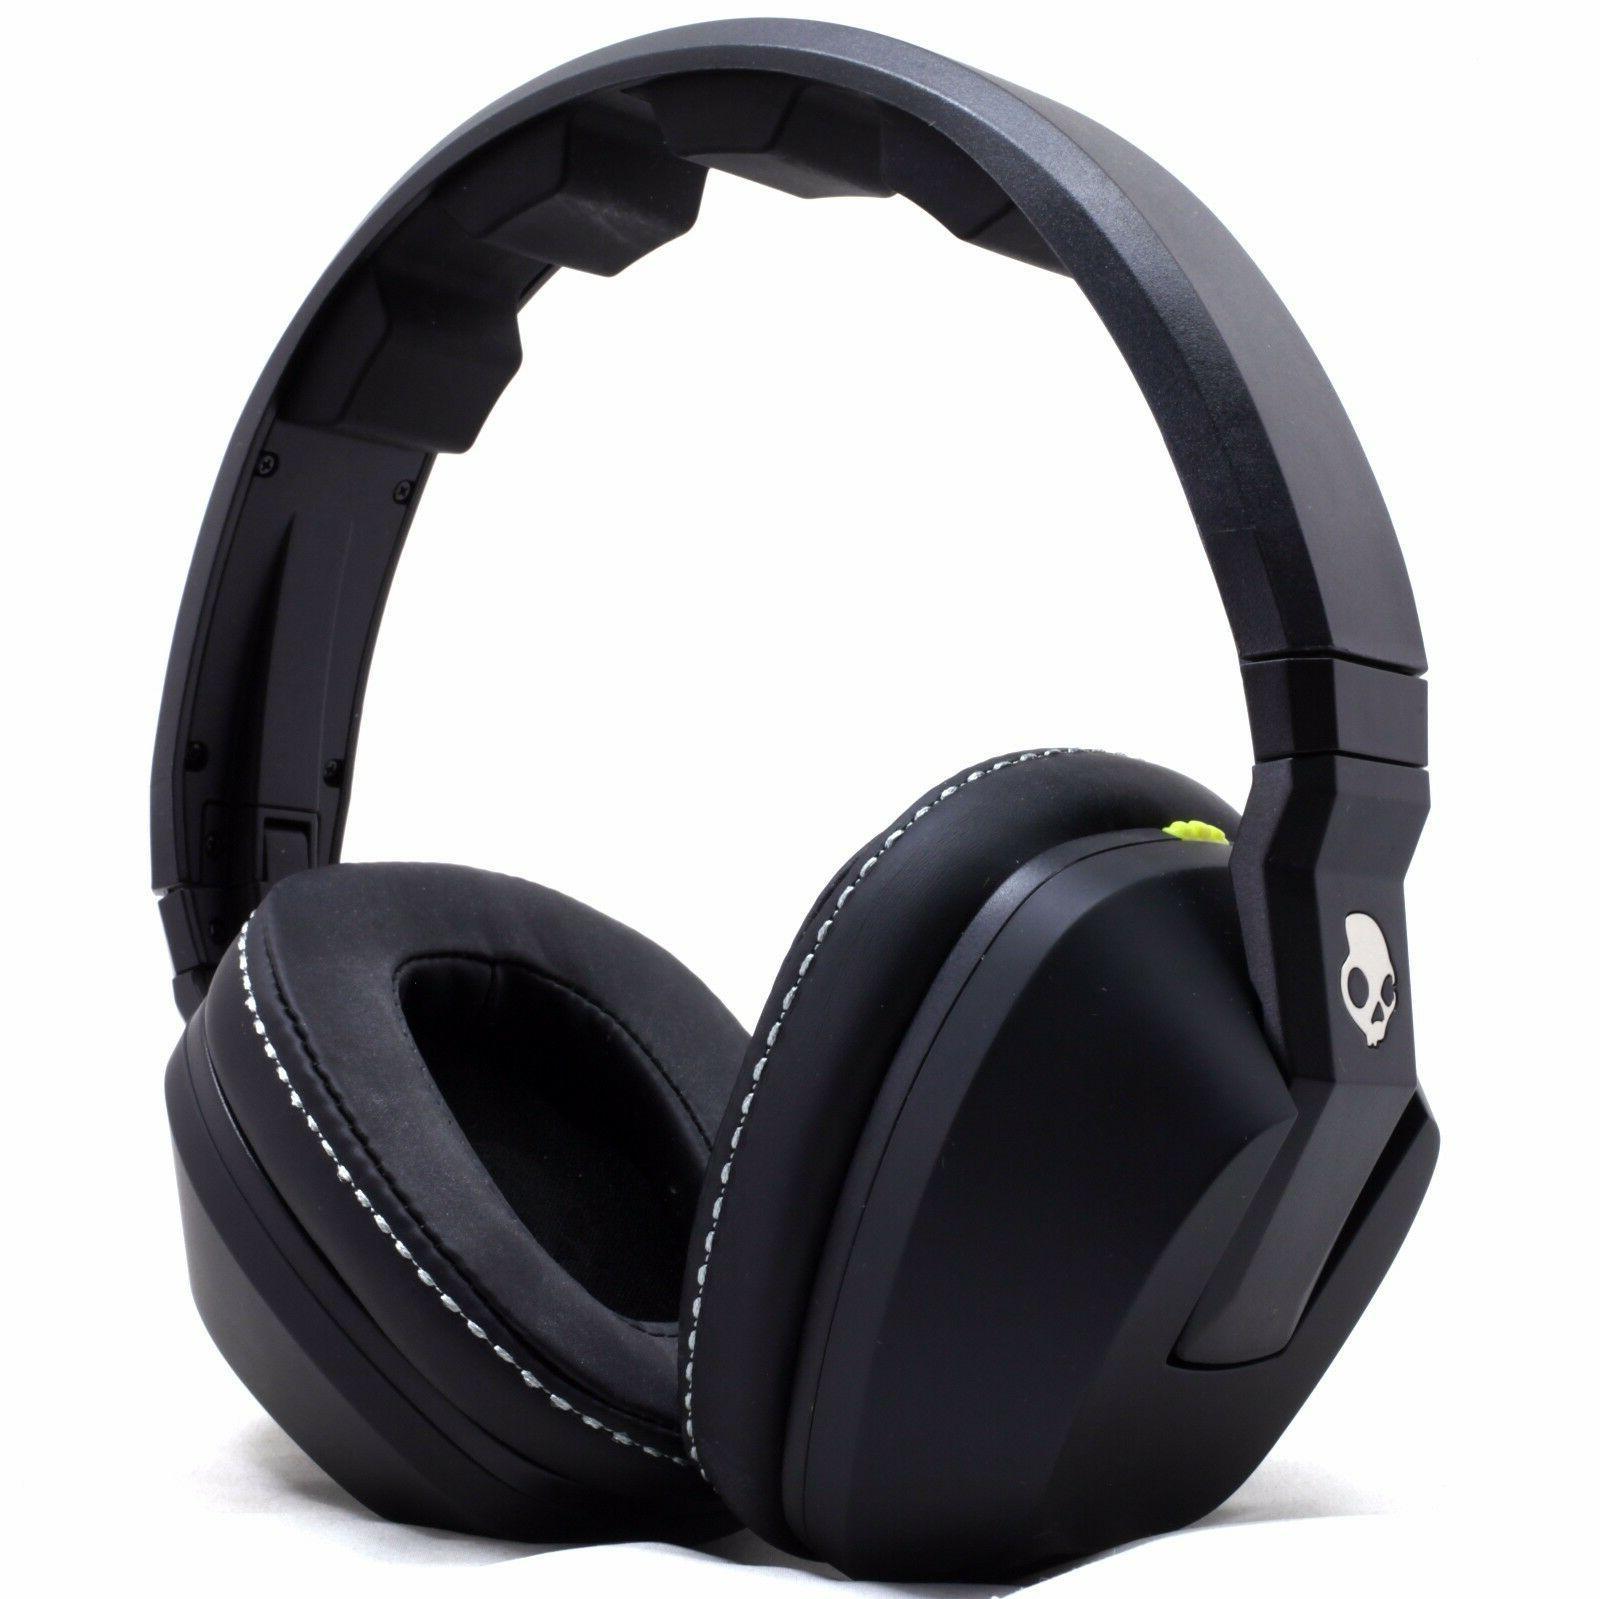 Skullcandy Stereo Headset Supreme Sound Bass Black White